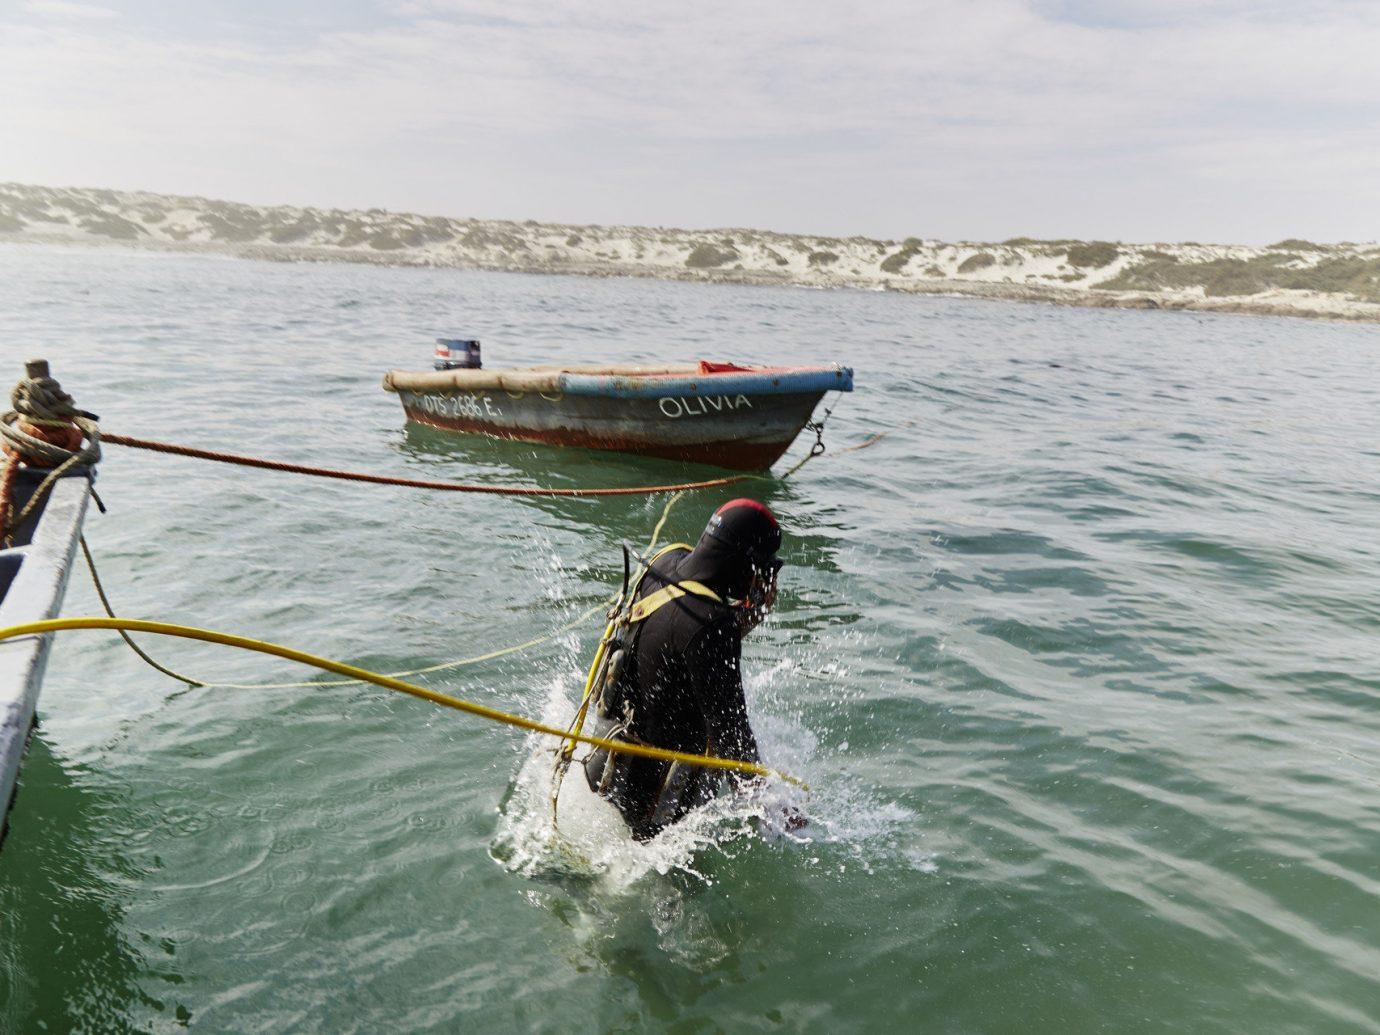 Hotels Luxury Travel water outdoor Boat boating vehicle Sea watercraft rowing sailing sea kayak watercraft paddle Rowing